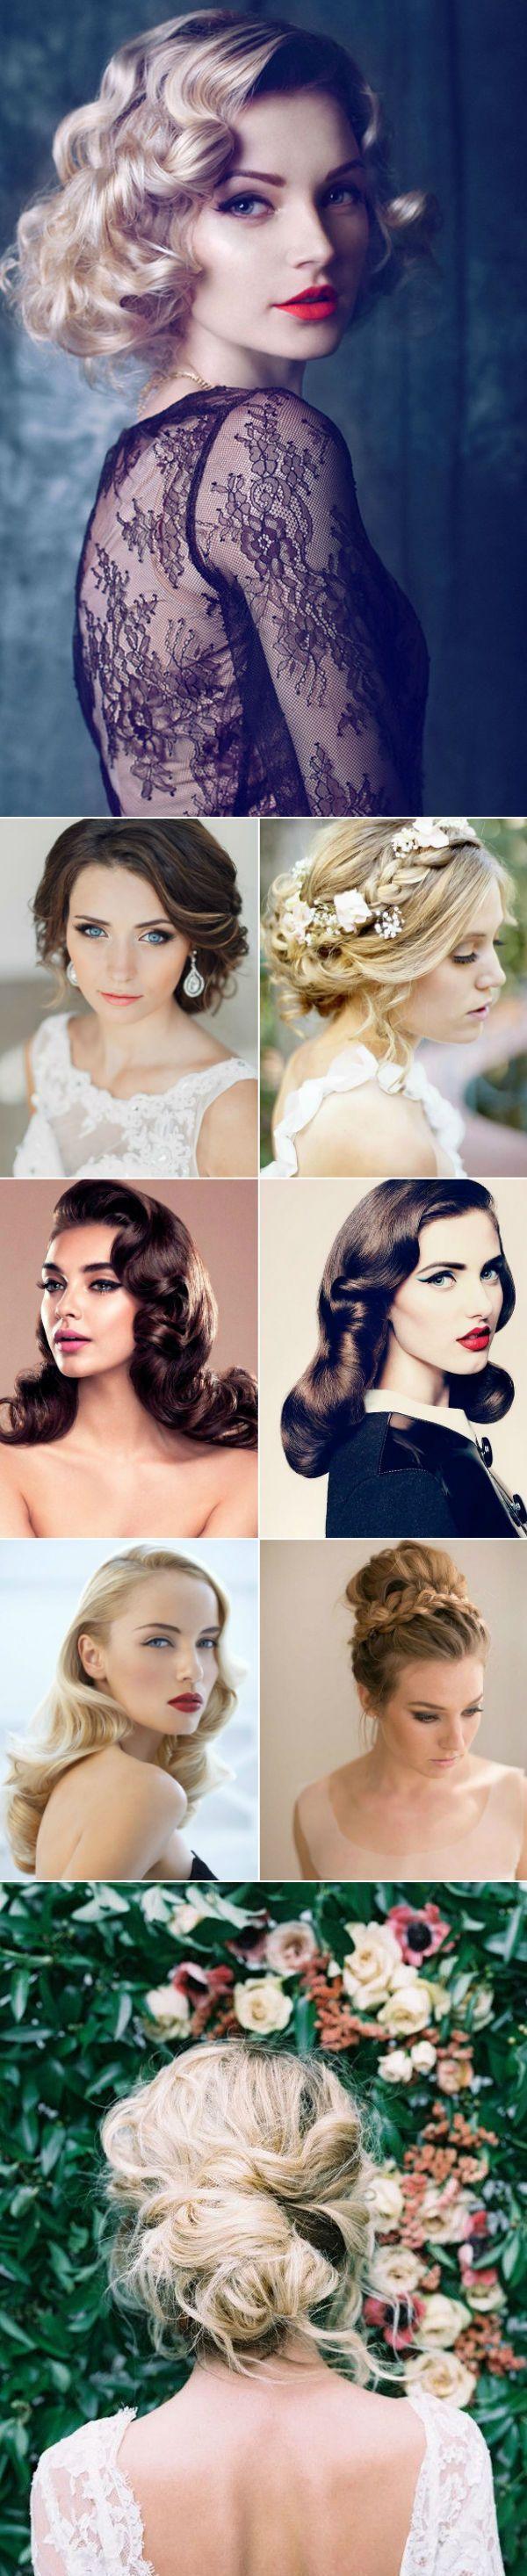 Mariage - 30 Stunning Vintage Wedding Ideas For Spring/Summer